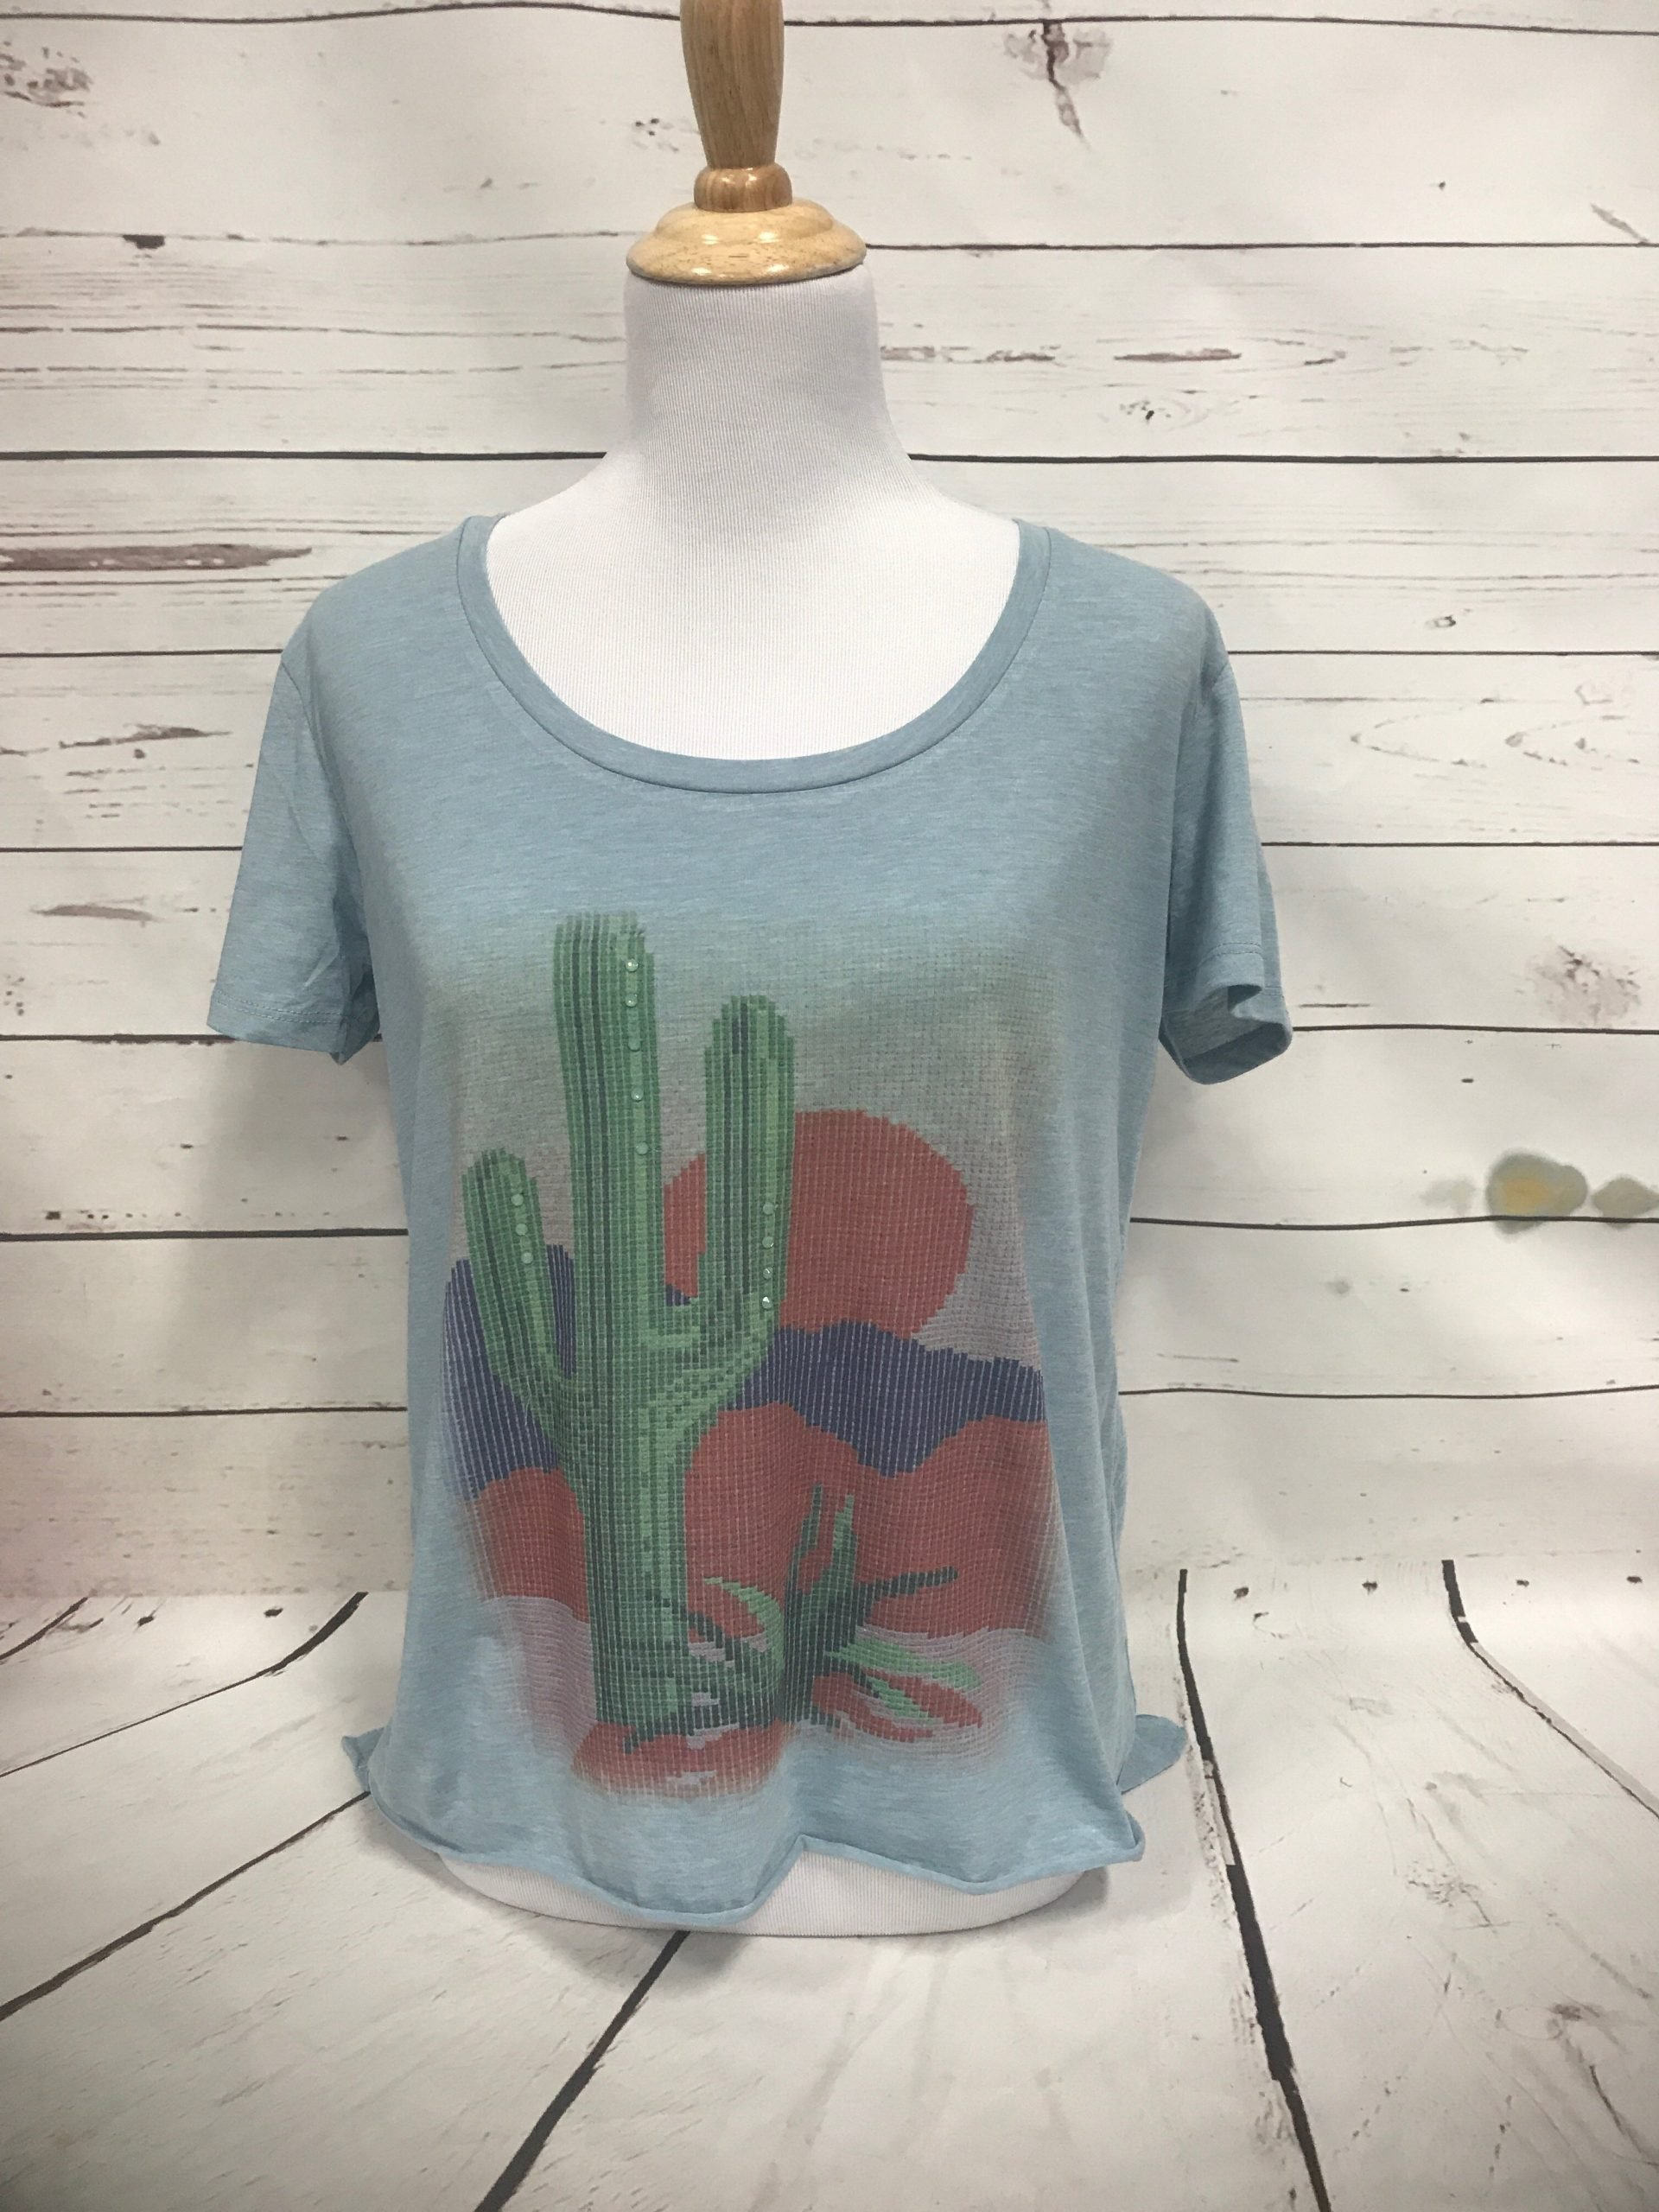 Latch Hook Cactus on Light Blue Tee